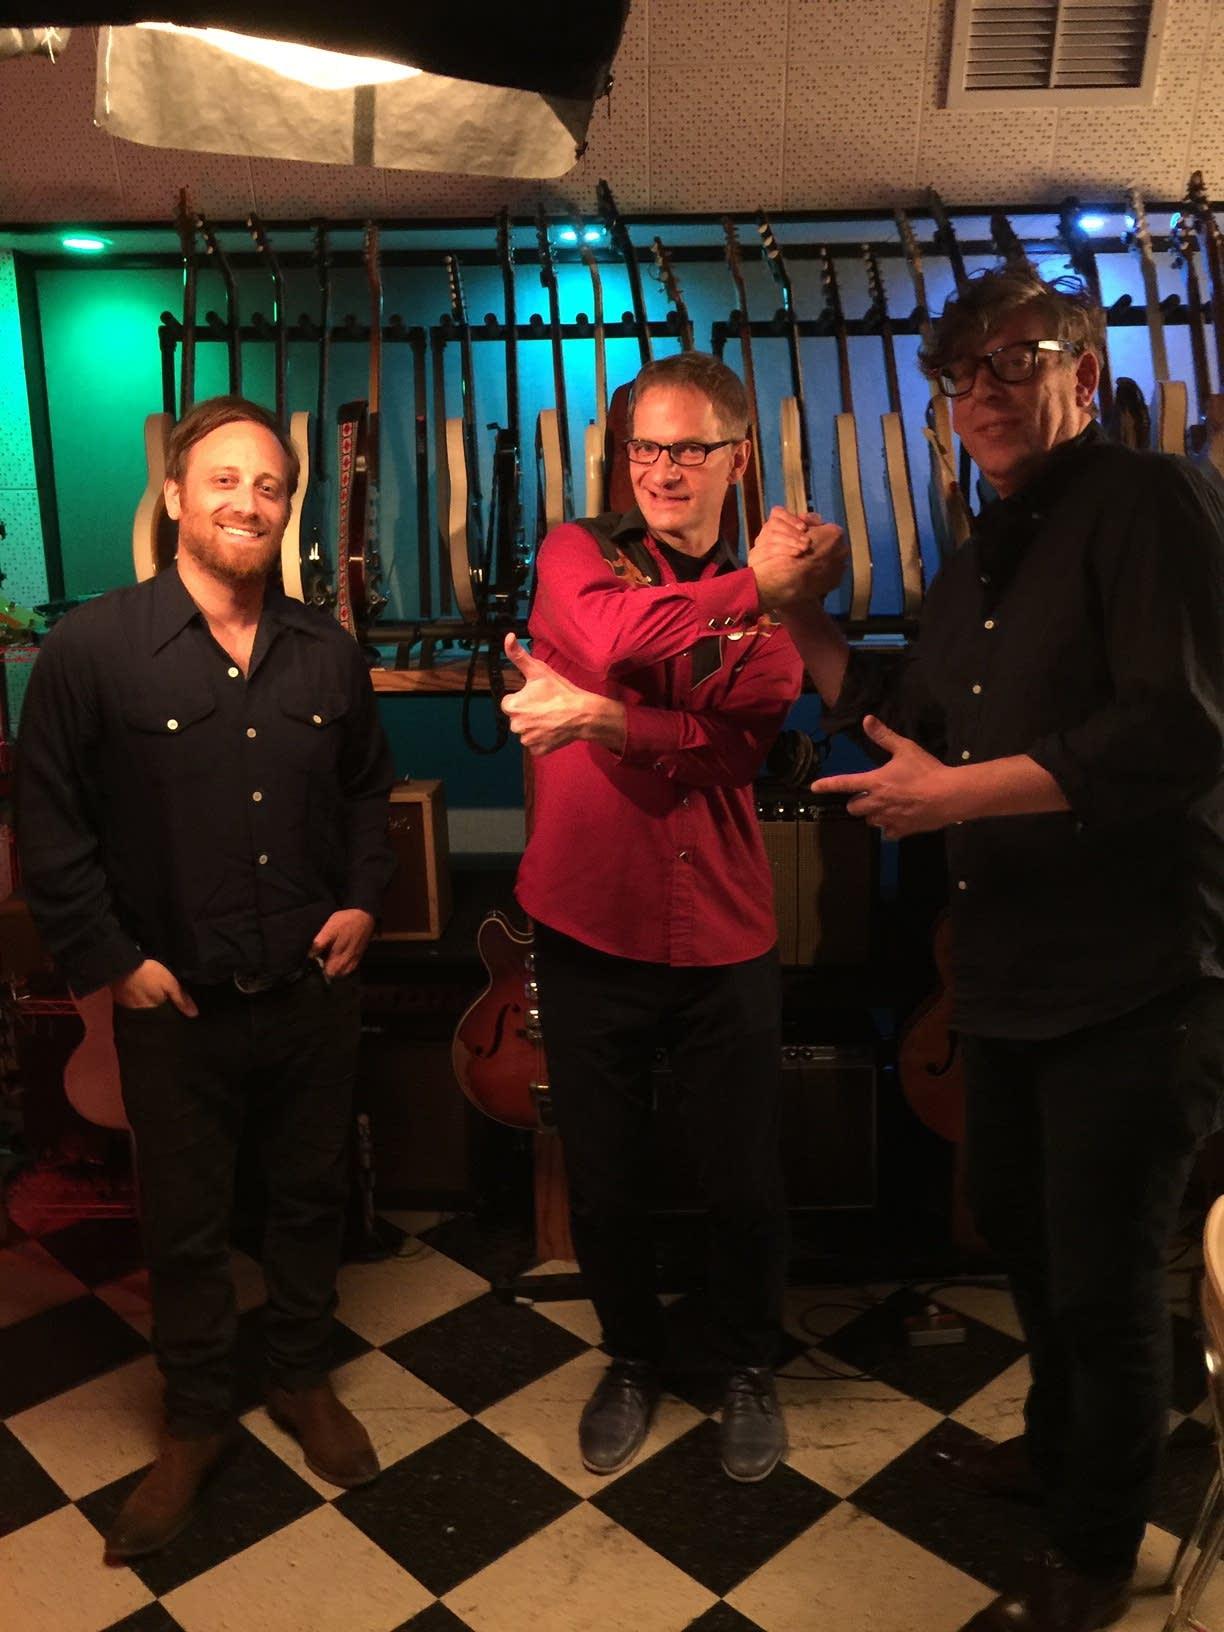 Jim McGuinn visits the Black Keys in Nashville